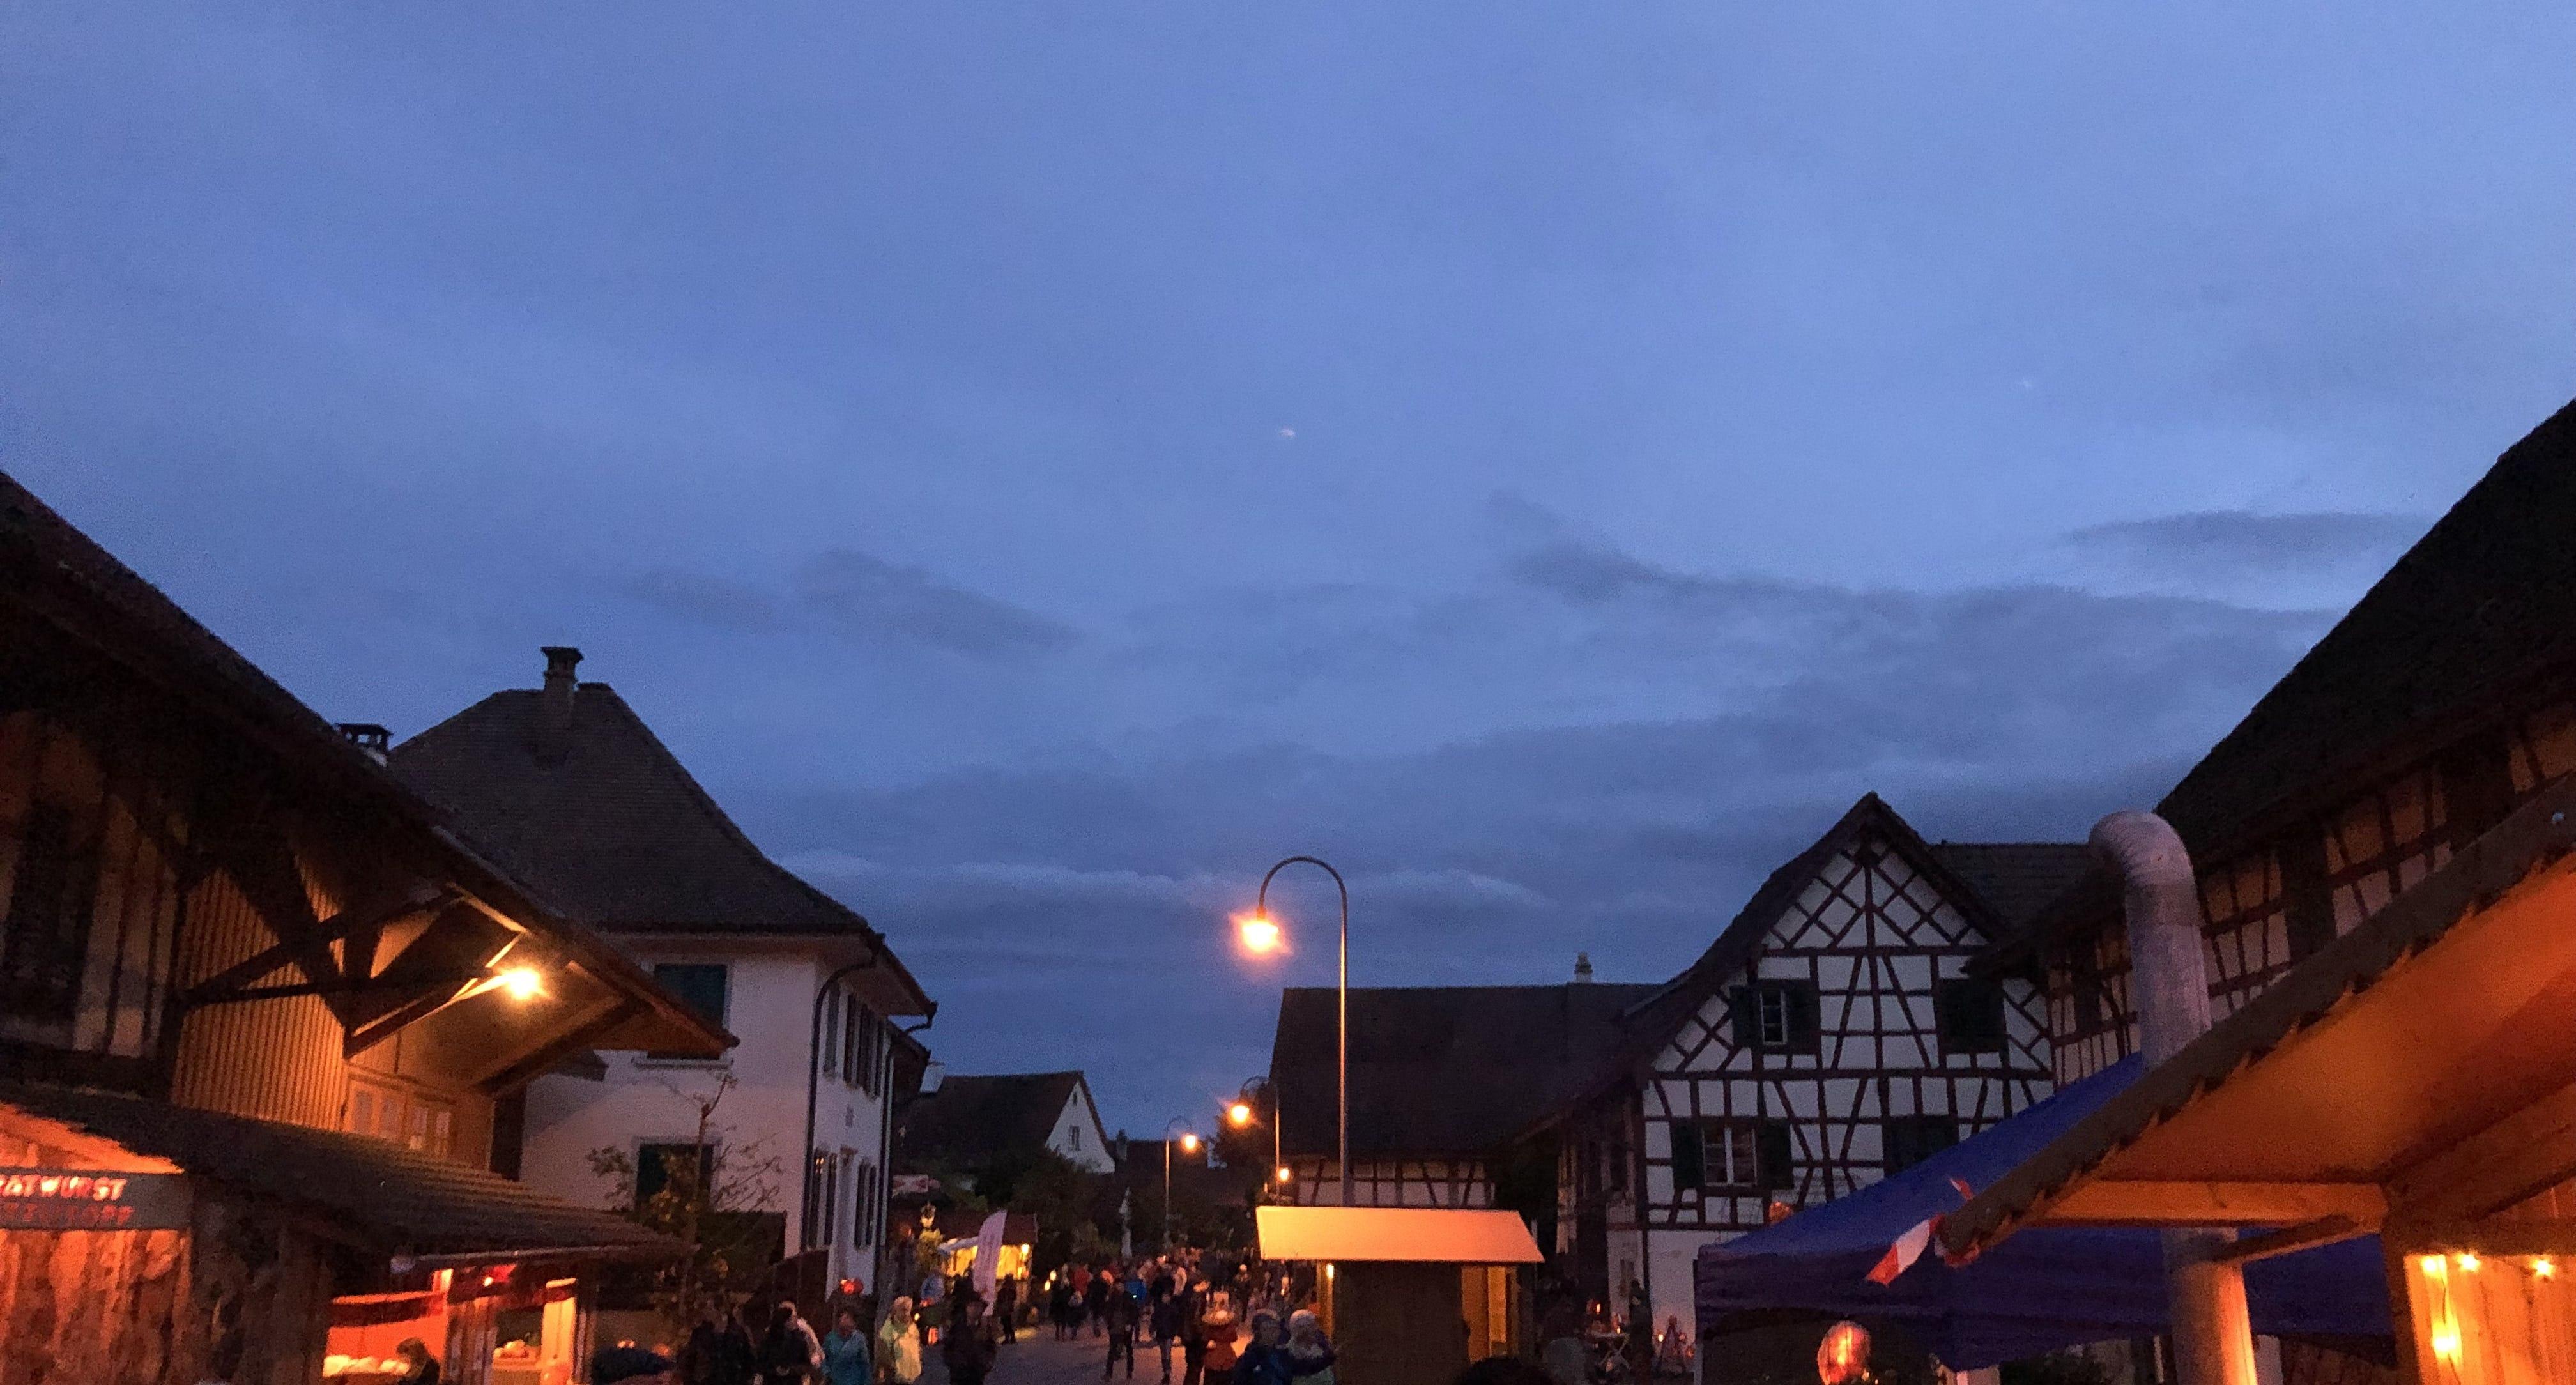 Kürbisbeleuchtung Rudolfingen Strasse